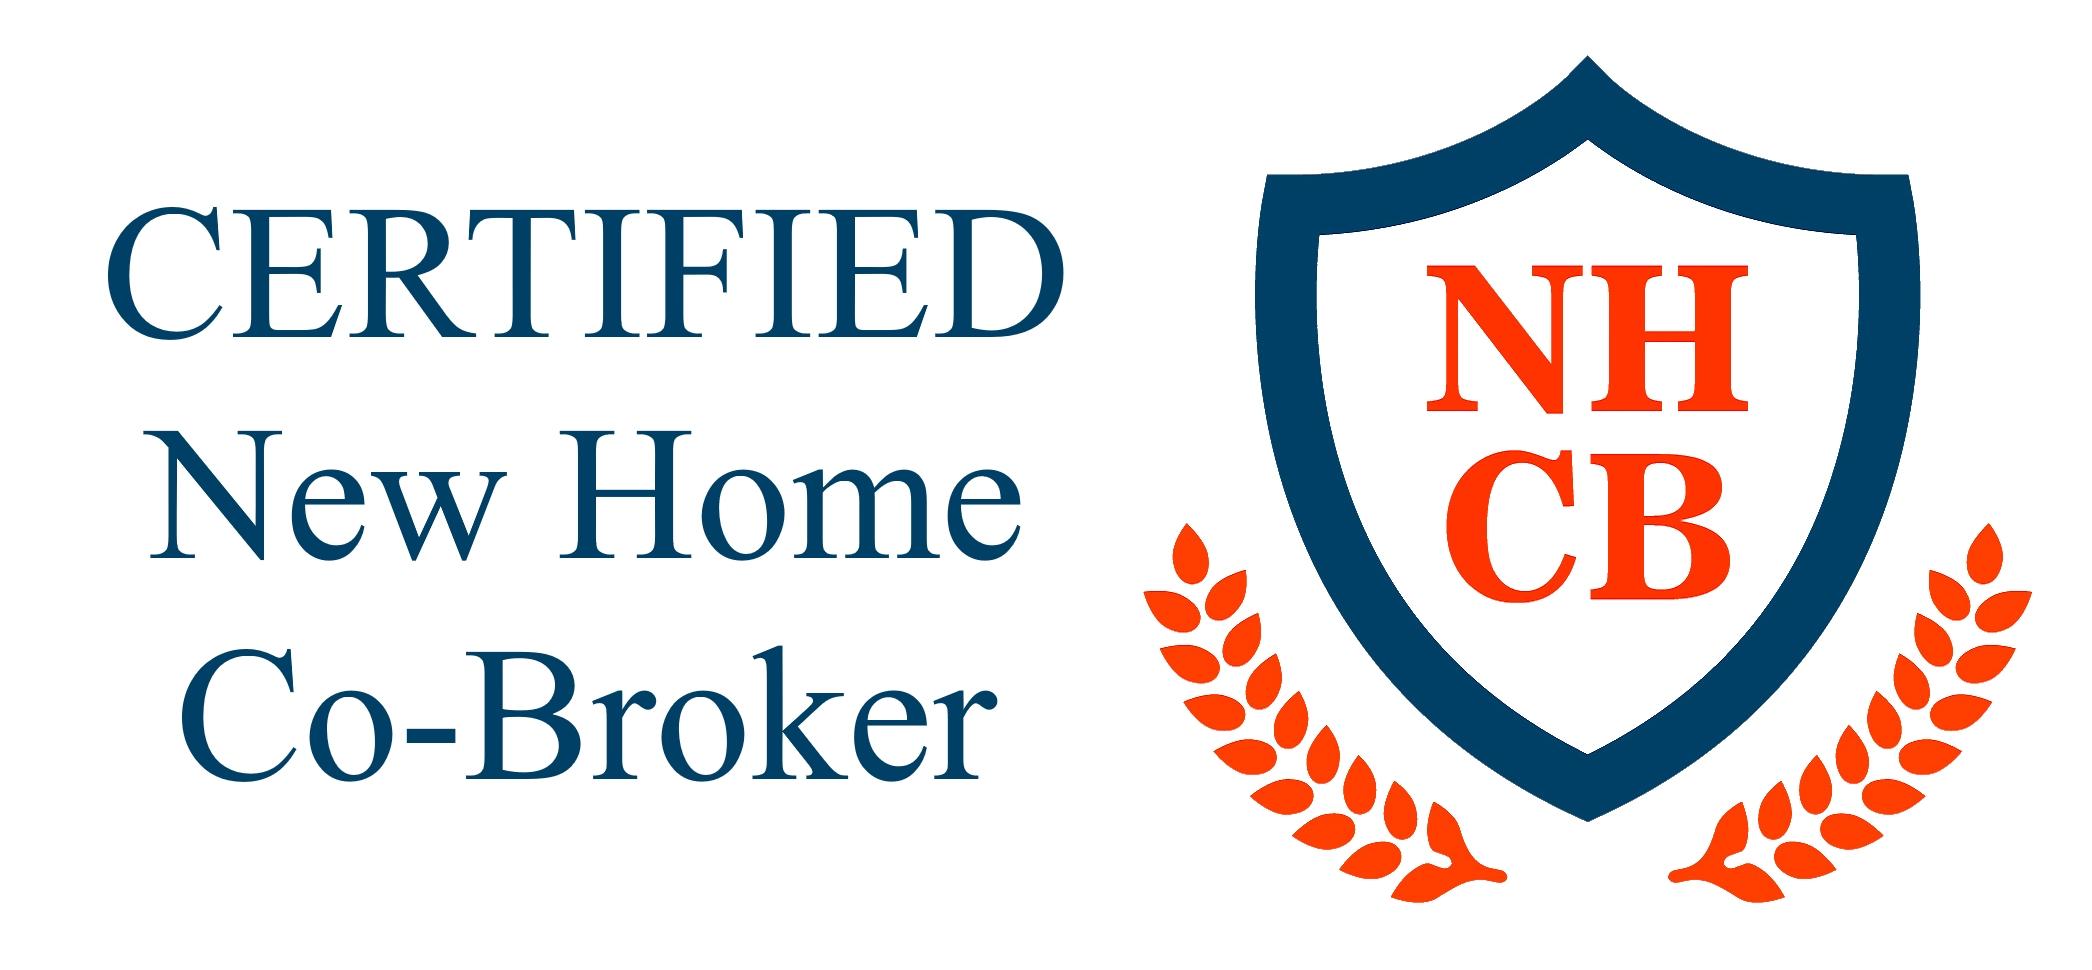 Treasure Coast Home Sales - New Homes